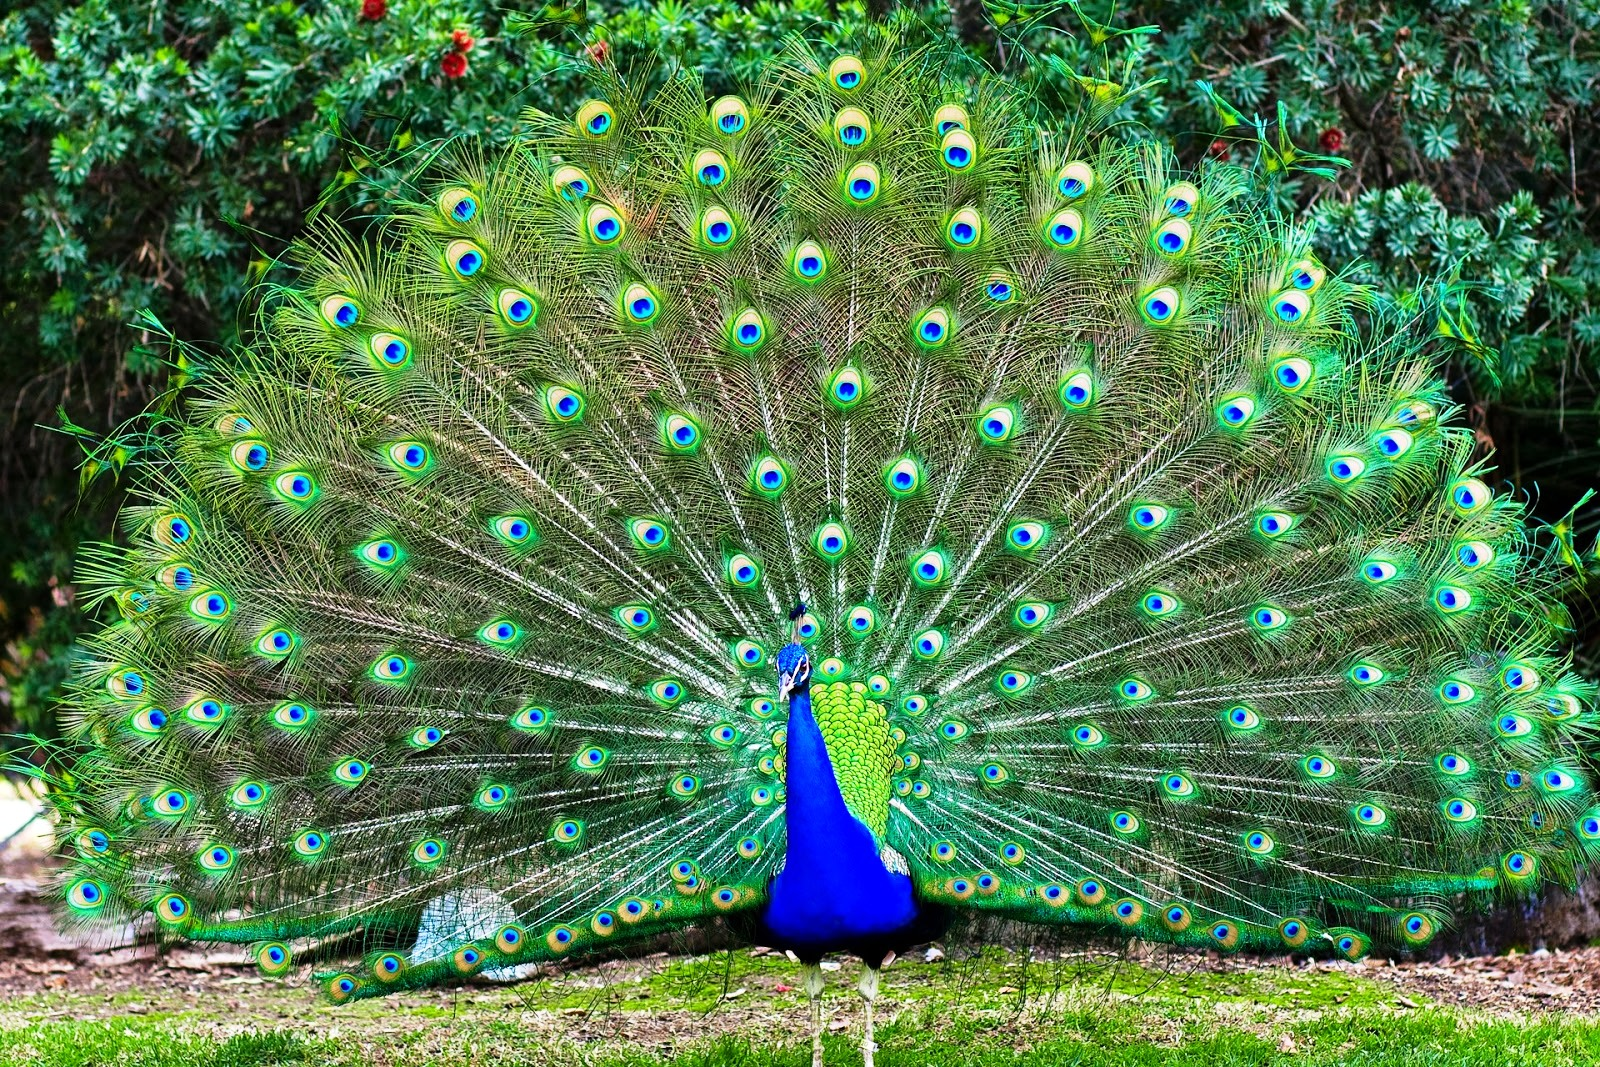 Burung Merak Hijau